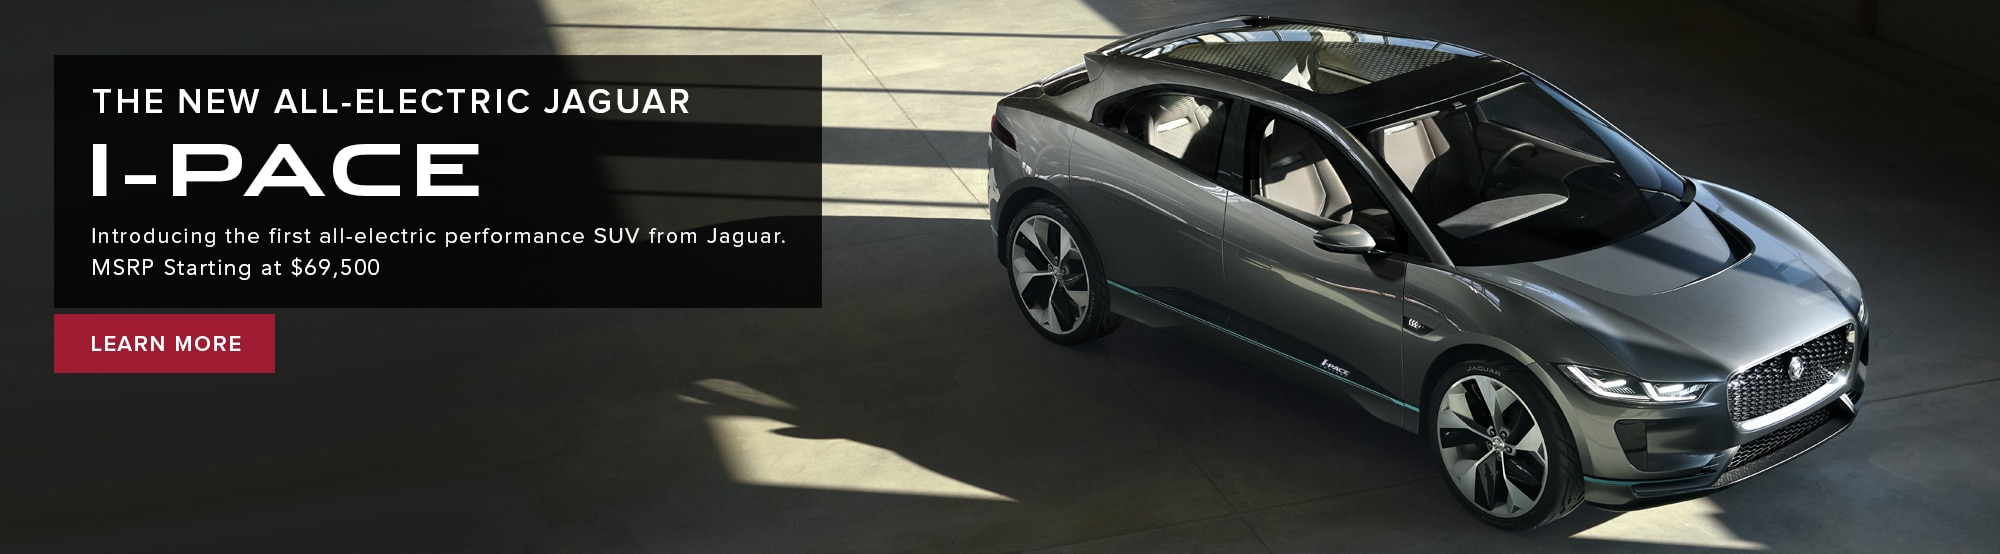 luxury and dealership near sports me denver cars dealers jaguar at fff porsche